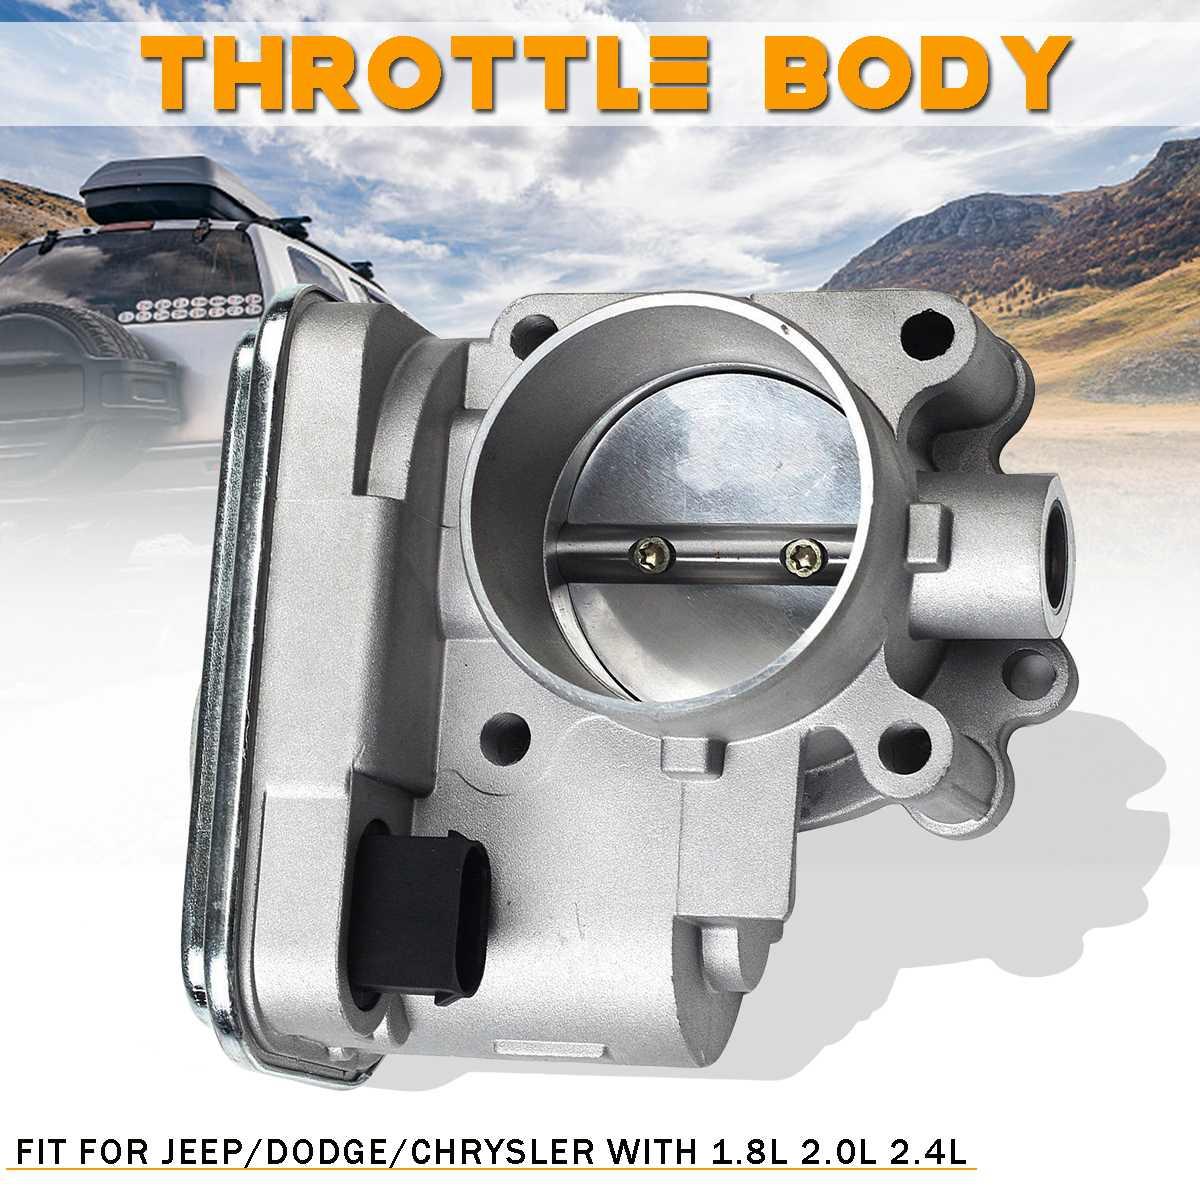 Complete คันเร่งสำหรับรถจี๊ป/Chrysler/Dodge/เข็มทิศ/Caliber 4884551AA 04891735AC ชิ้นส่วนทดแทนอัตโนมัติ 1.8L 2.0L 2.4L